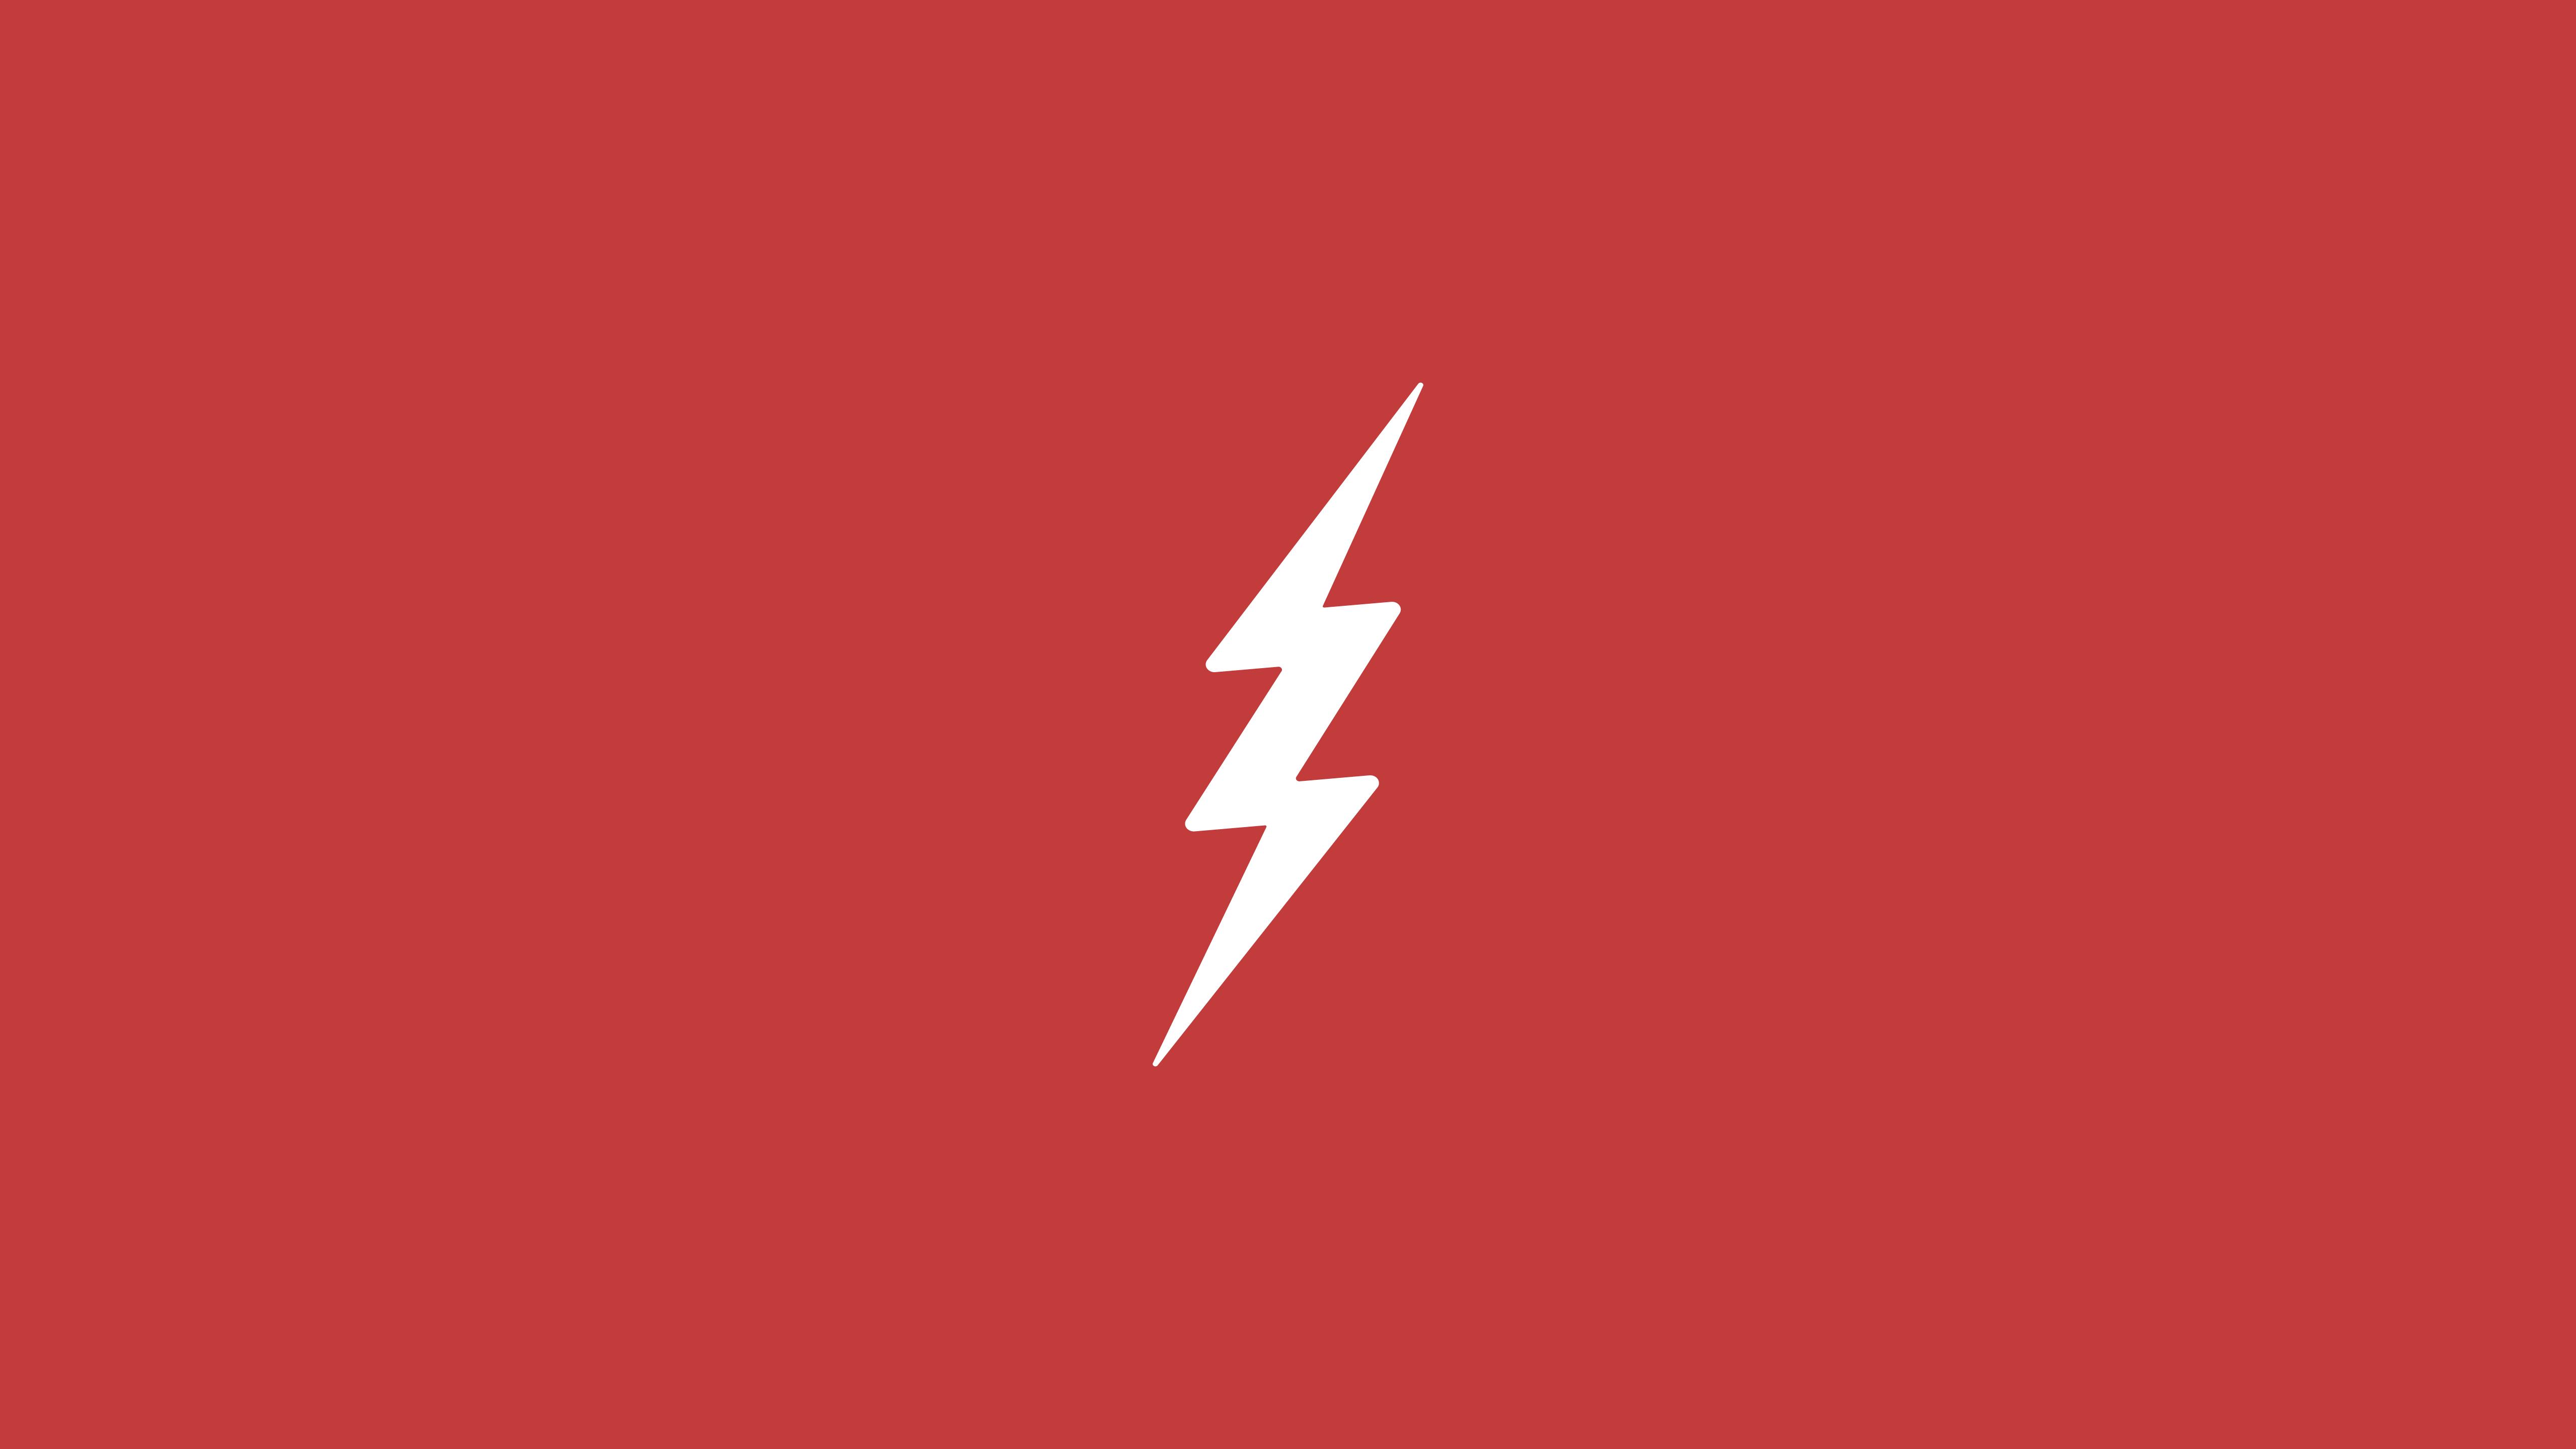 Flash logo minimalism hd artist 4k wallpapers images for A minimalist